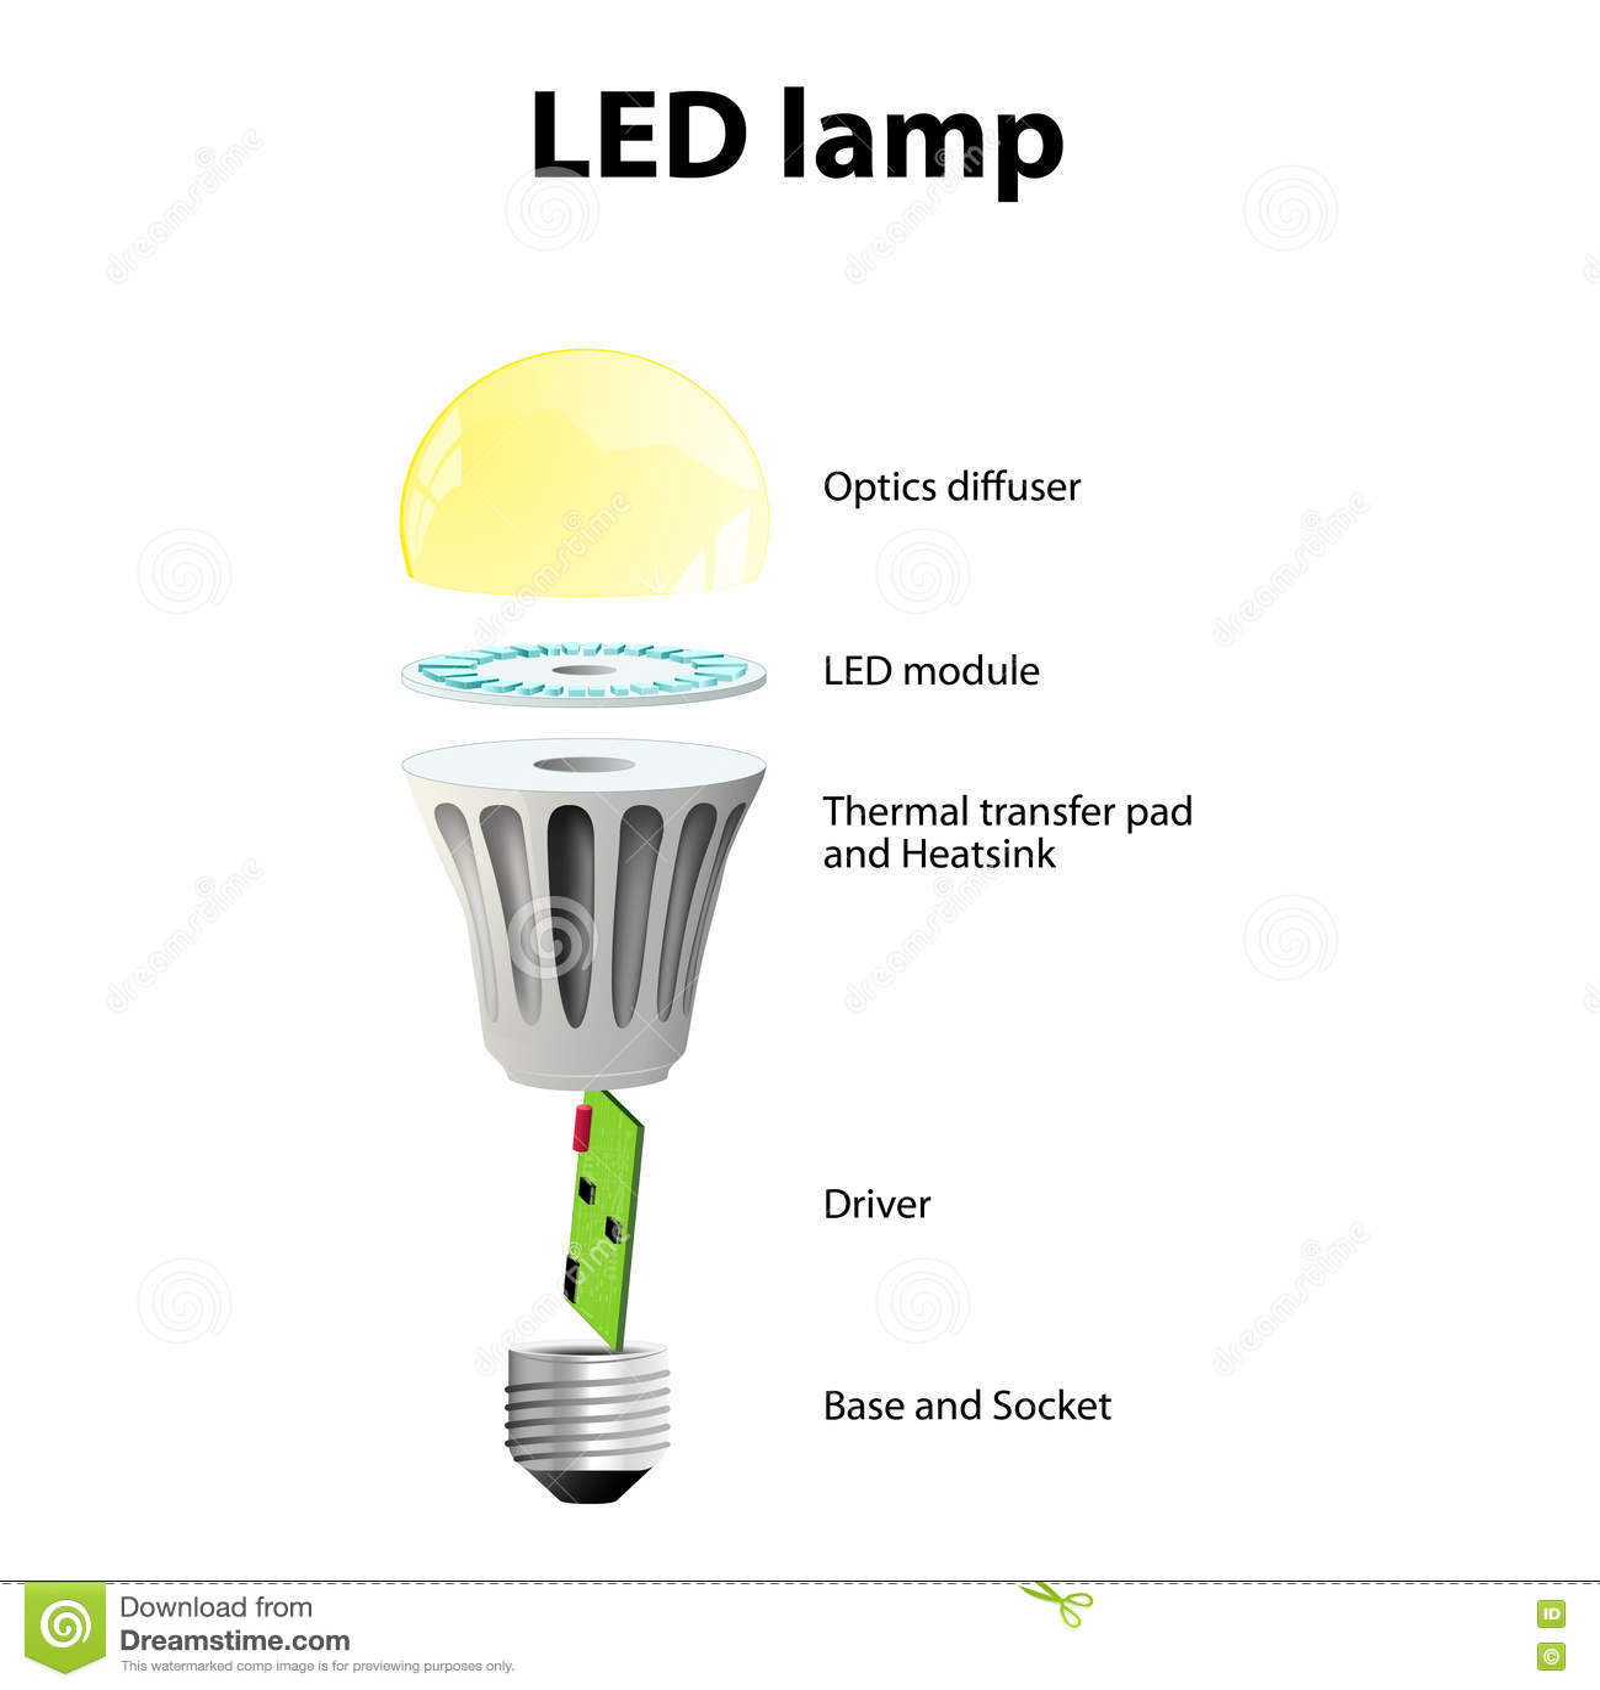 hight resolution of basic components of led light bulbs stock vector illustration of led light bulb diagram diagram of the led lamp